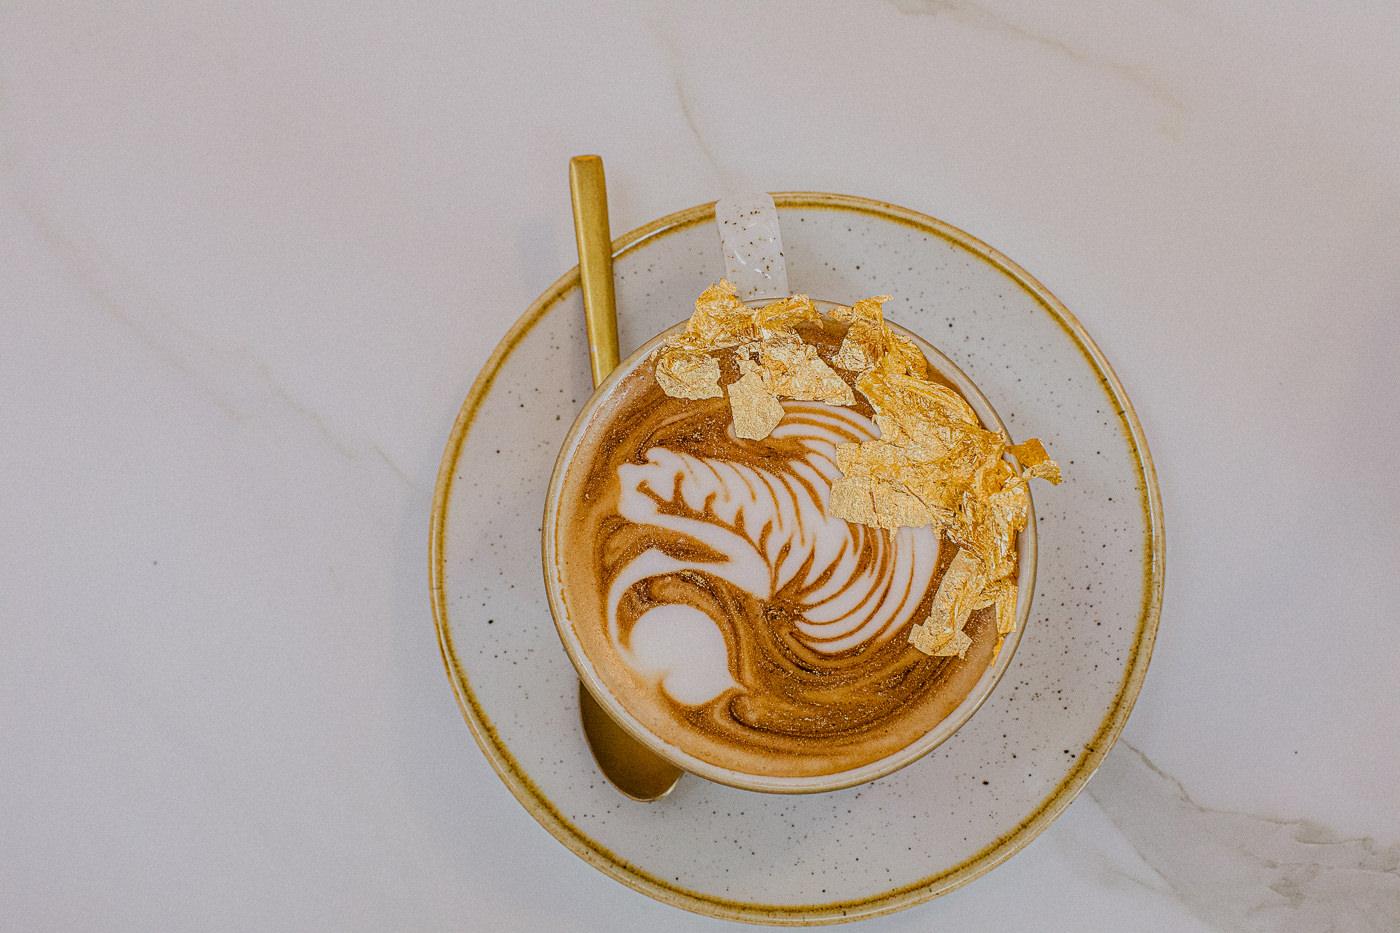 24K Gold Cafe - edible gold